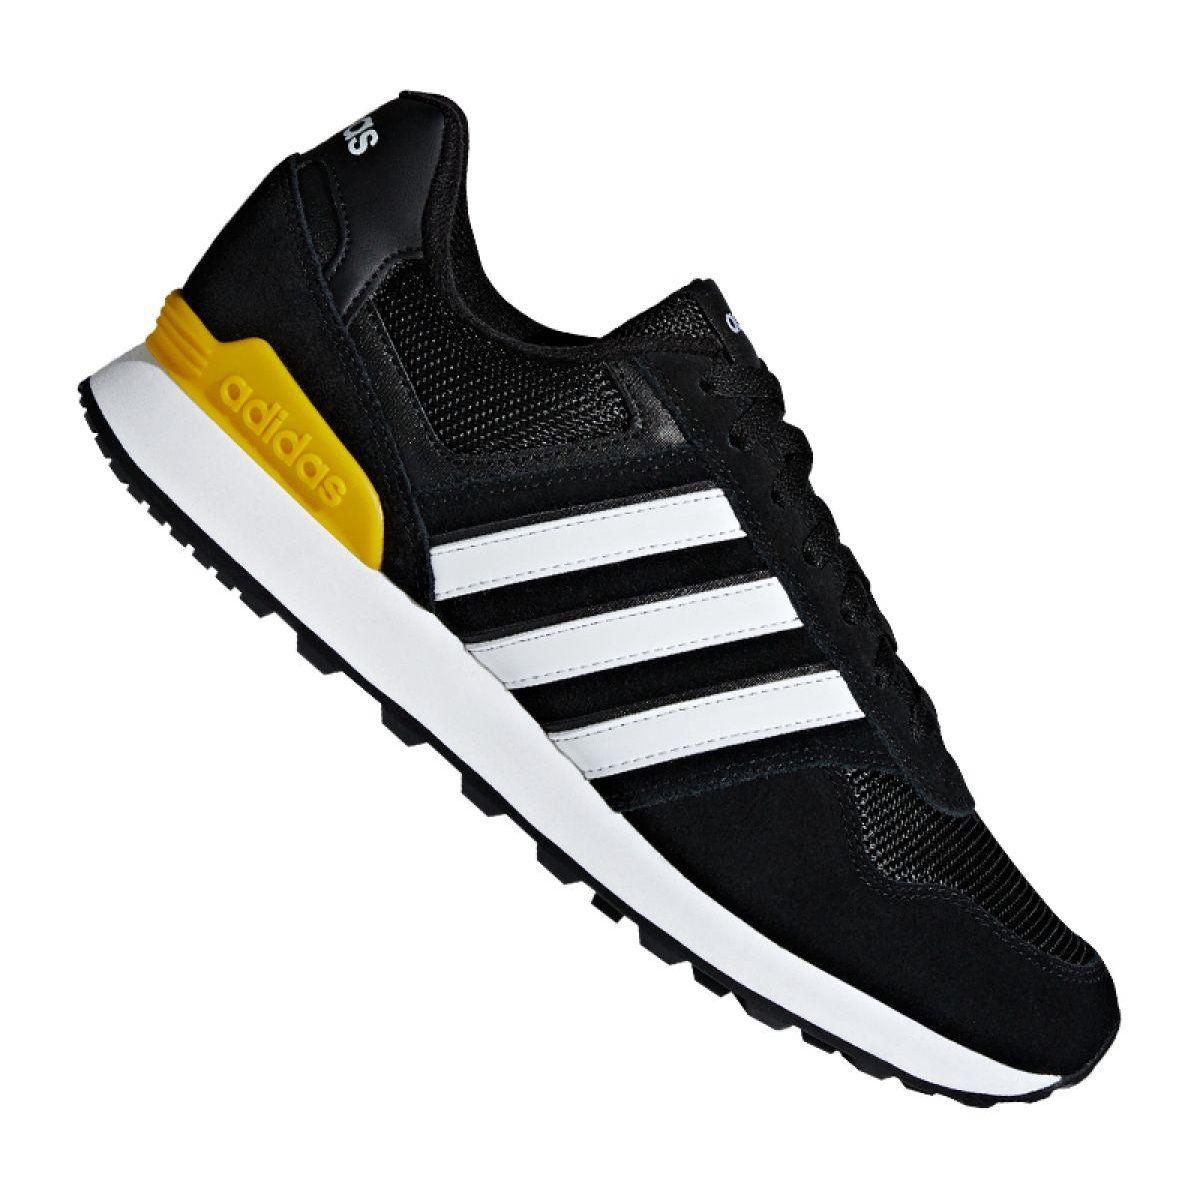 Sportowe Meskie Adidas Buty Adidas 10k M F34457 Czarne Suede Design Black Shoes Adidas